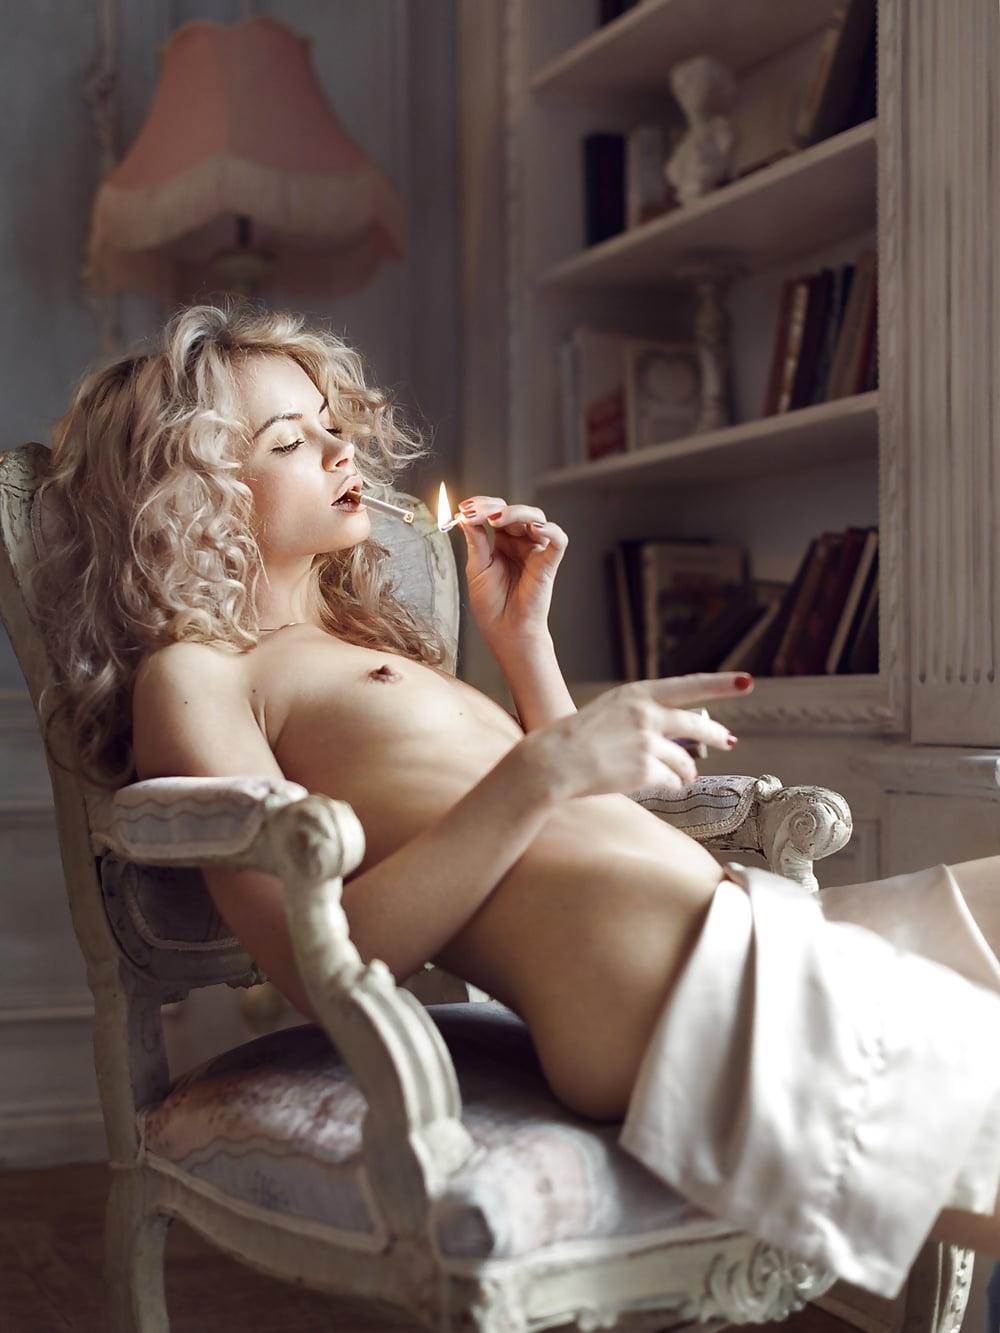 Порно видео будуар, анал зрелые фотографии галереи